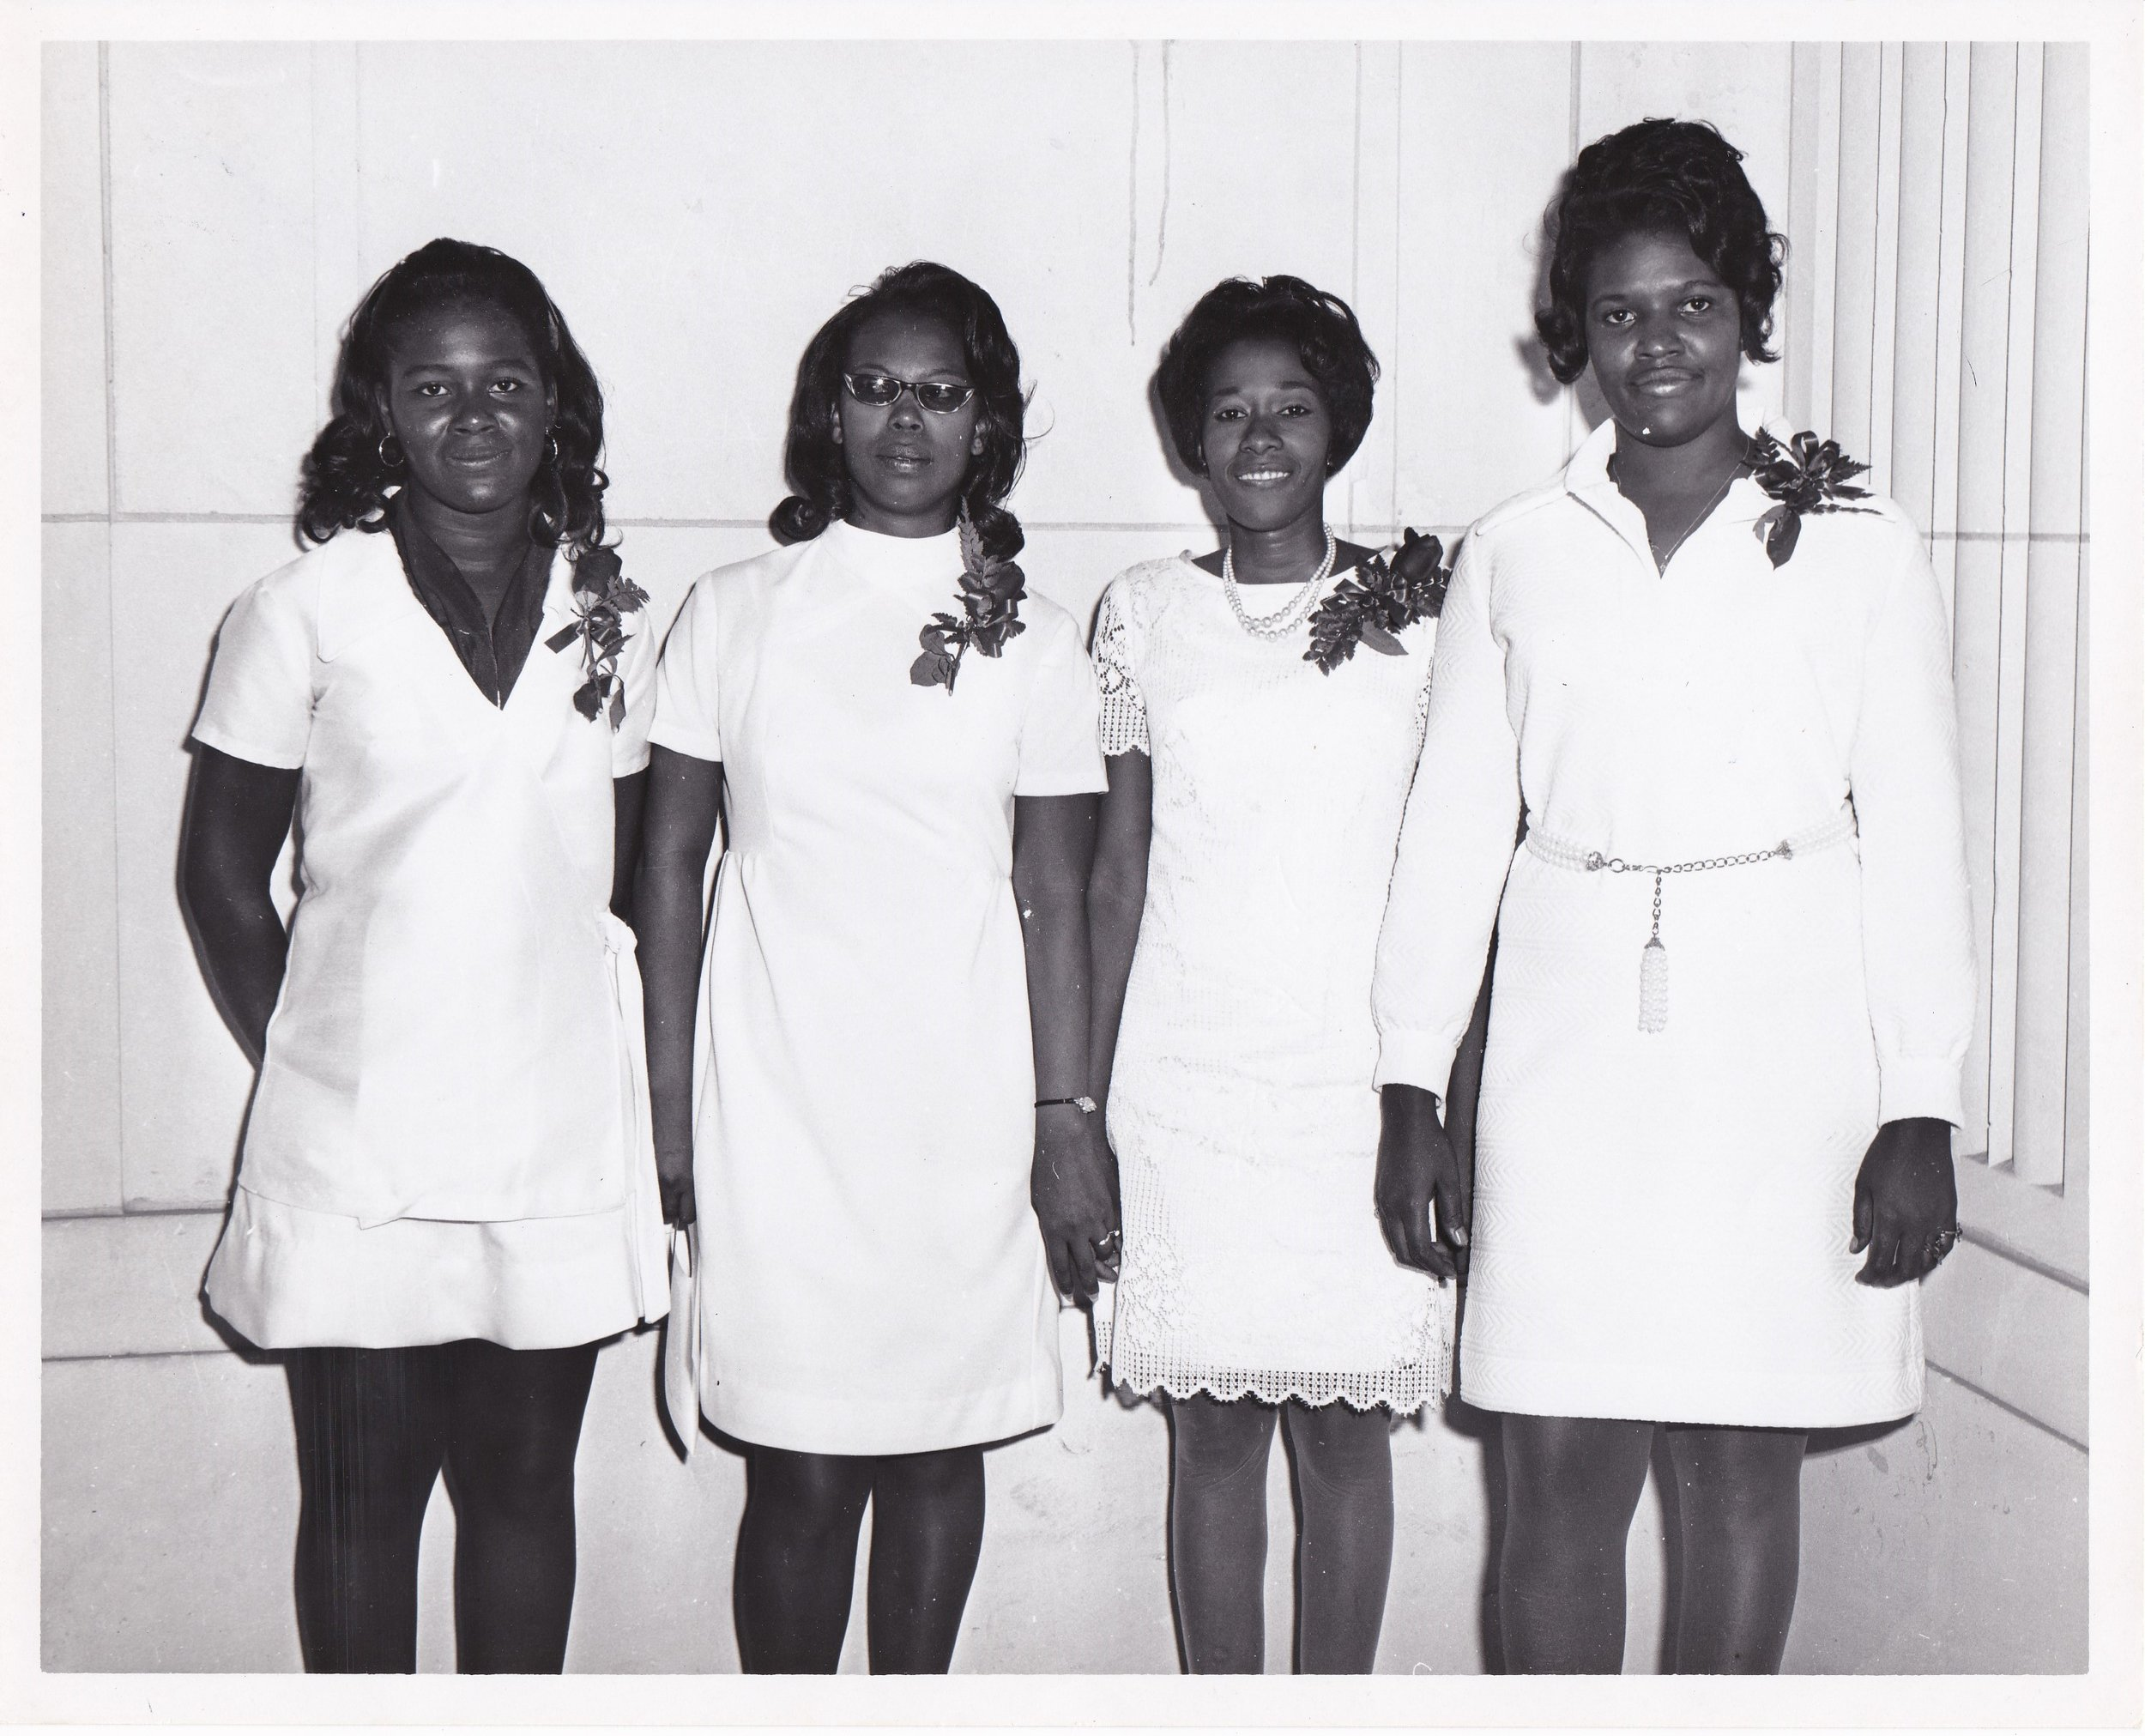 '70 Donna Sylva, Leah Harper, Ruth Taylor, and Student